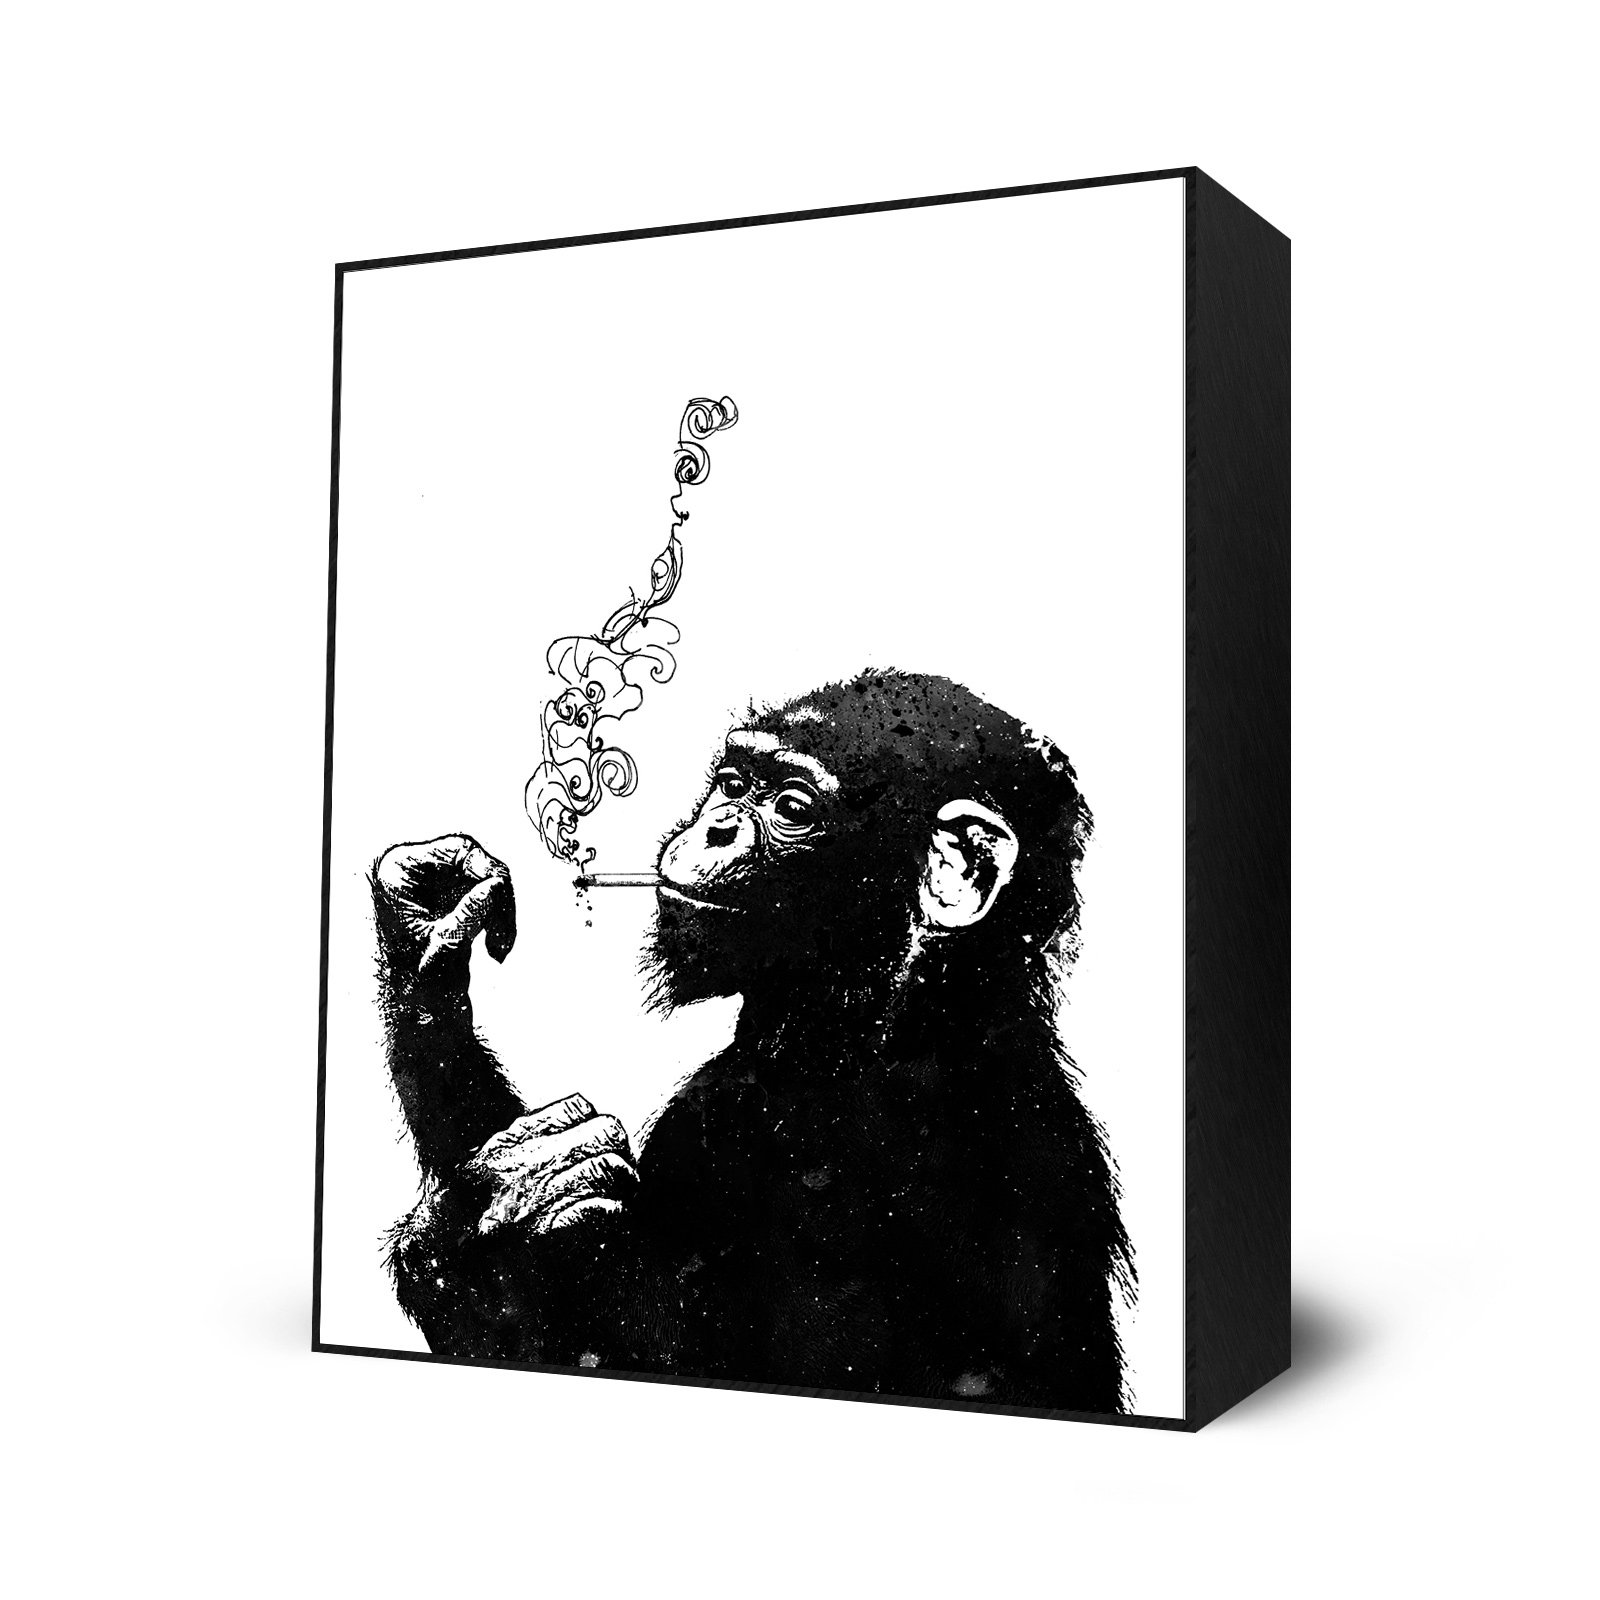 Bitch, Don't Kill My Vibe by Alex Cherry - Mini Art Block Print - 10 x 12 inches by Eyes On Walls